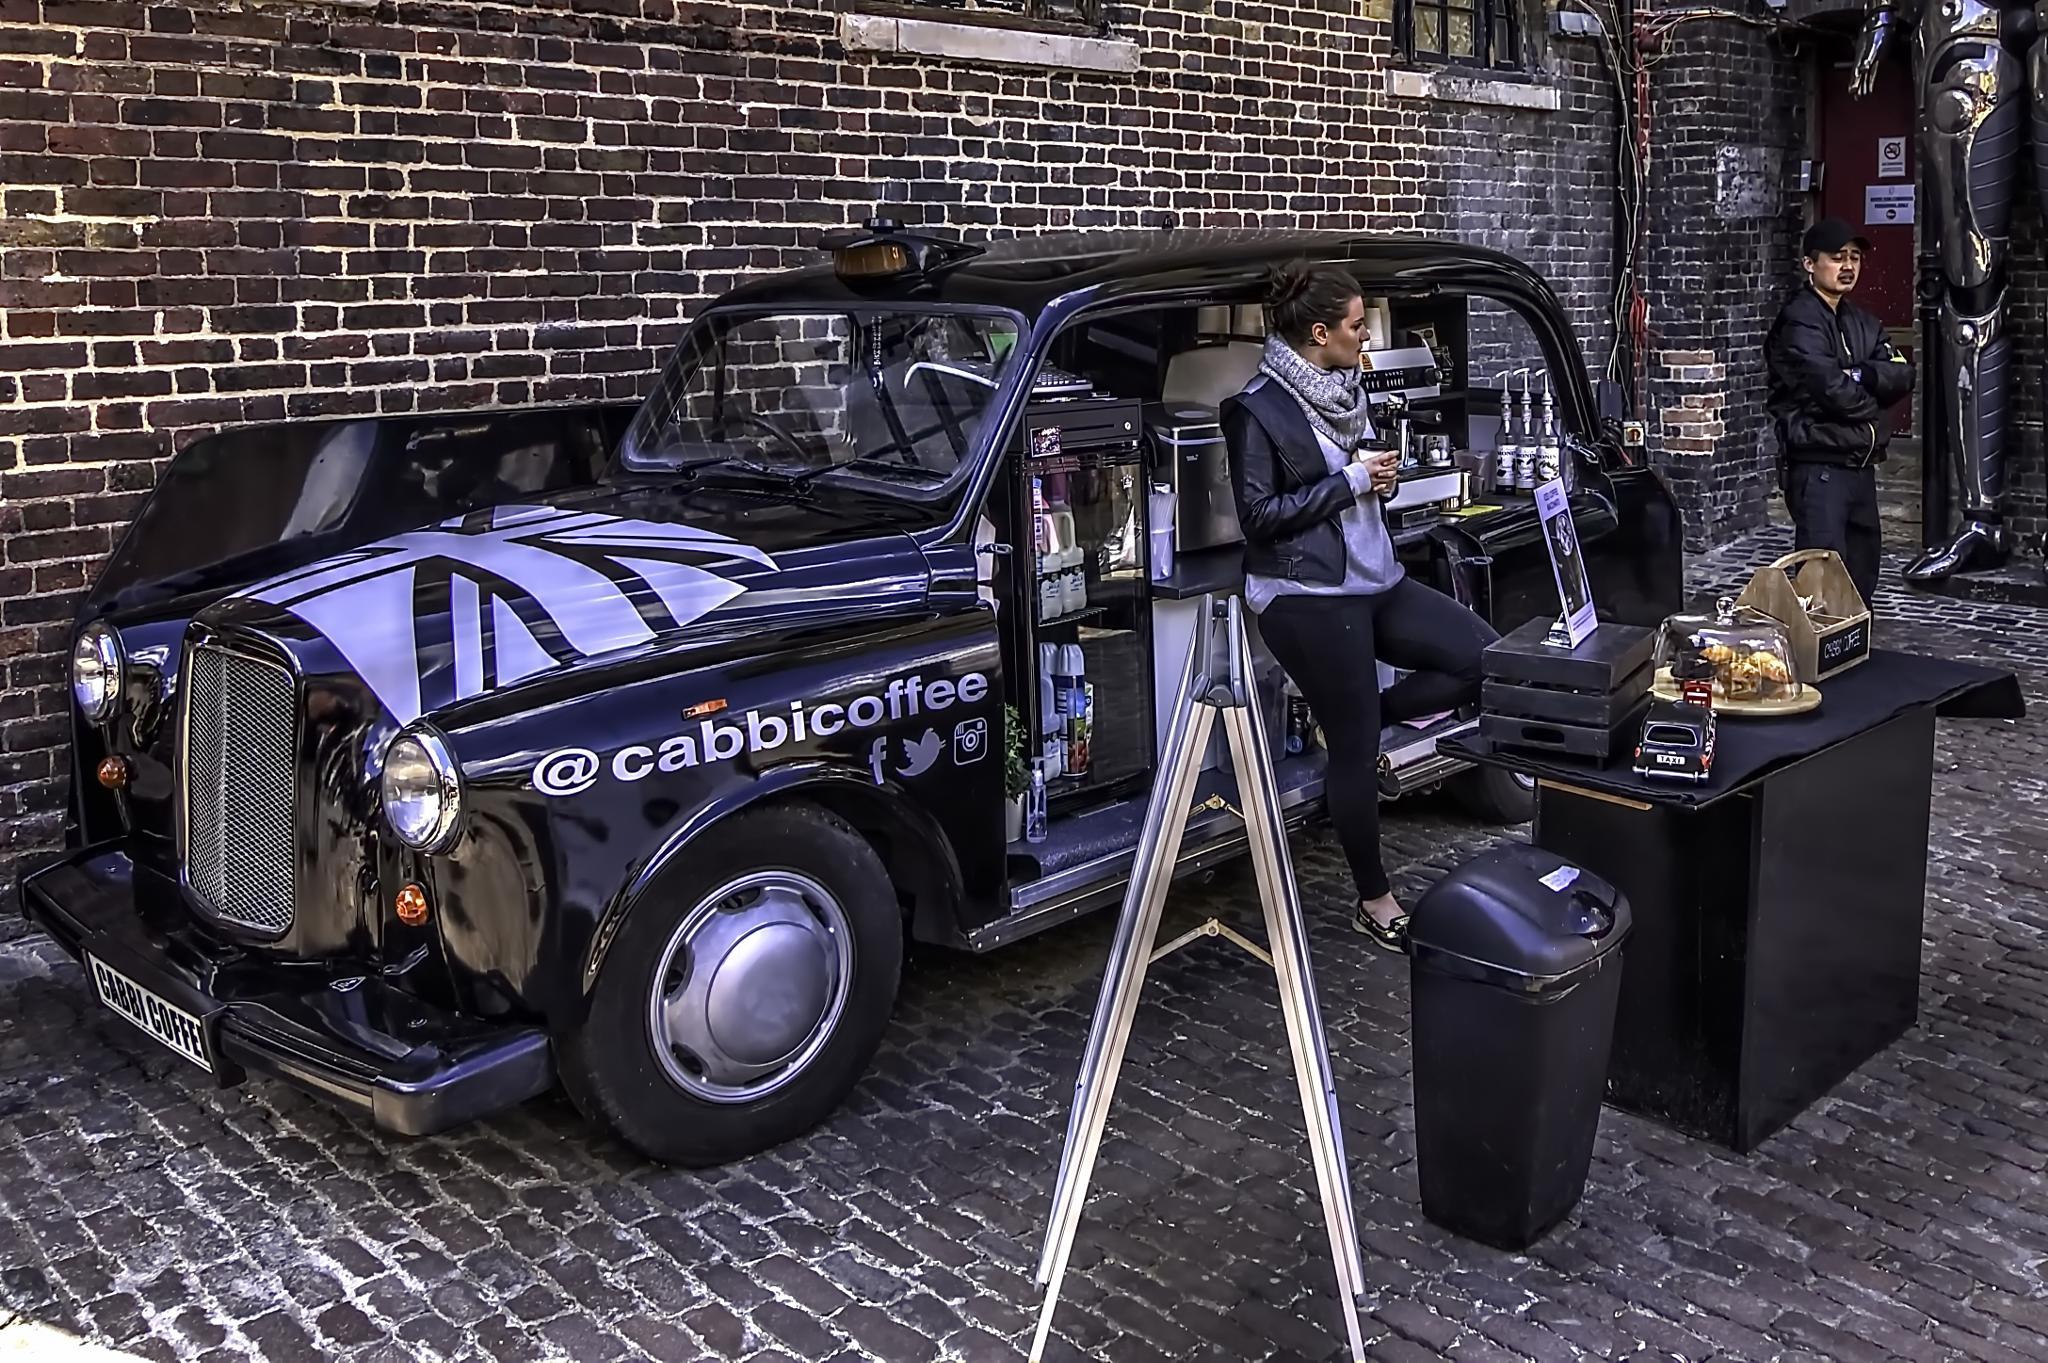 Cabbicoffee by WSimone